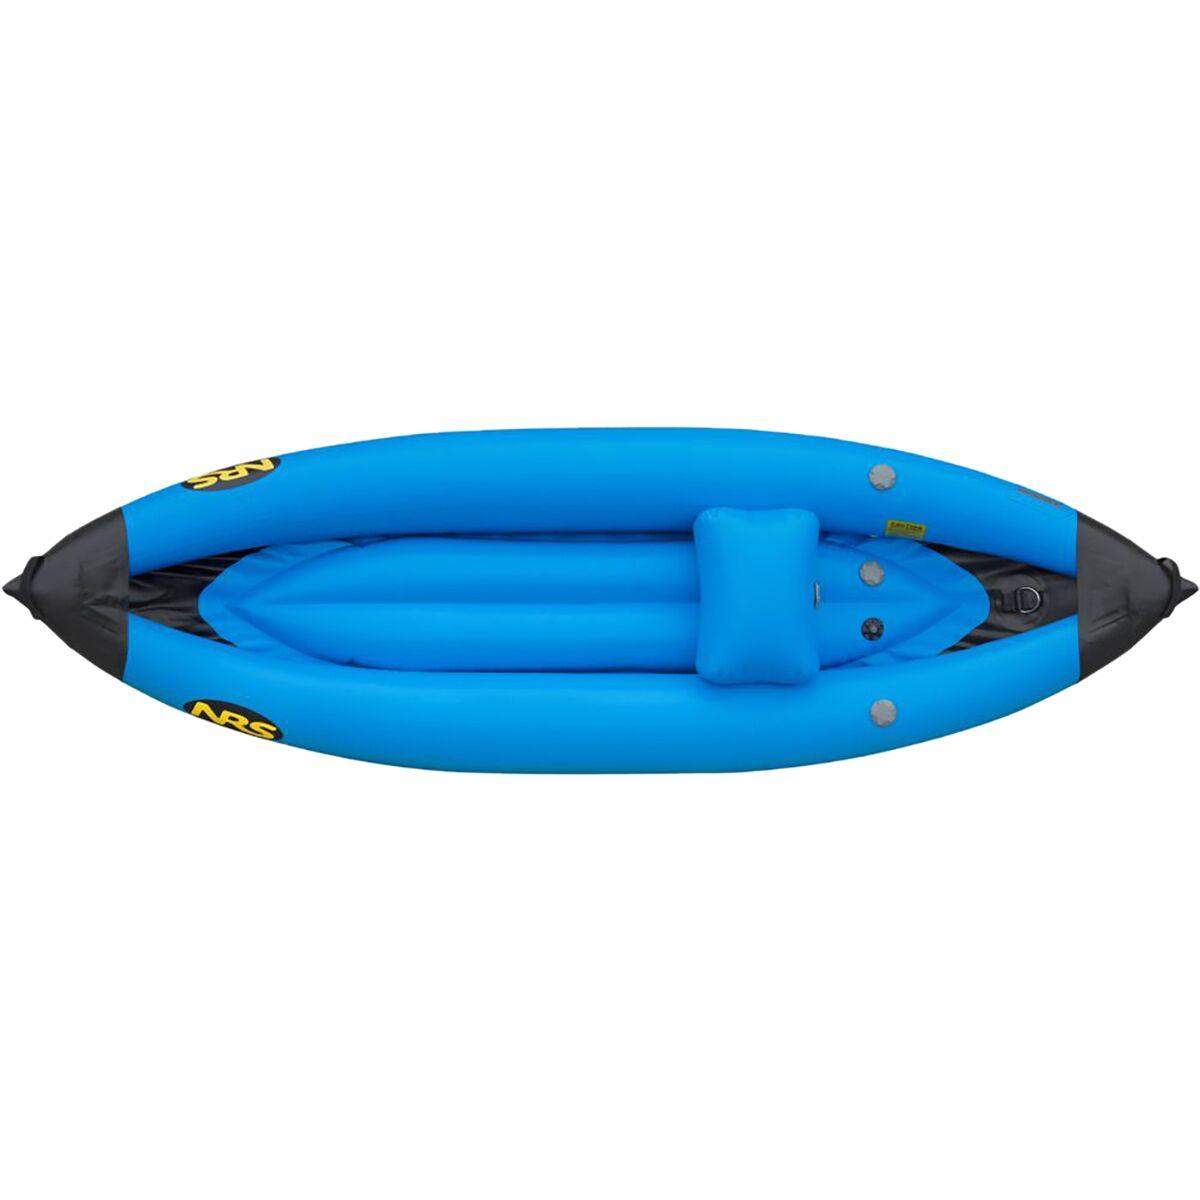 photo: NRS MaverIK I inflatable kayak